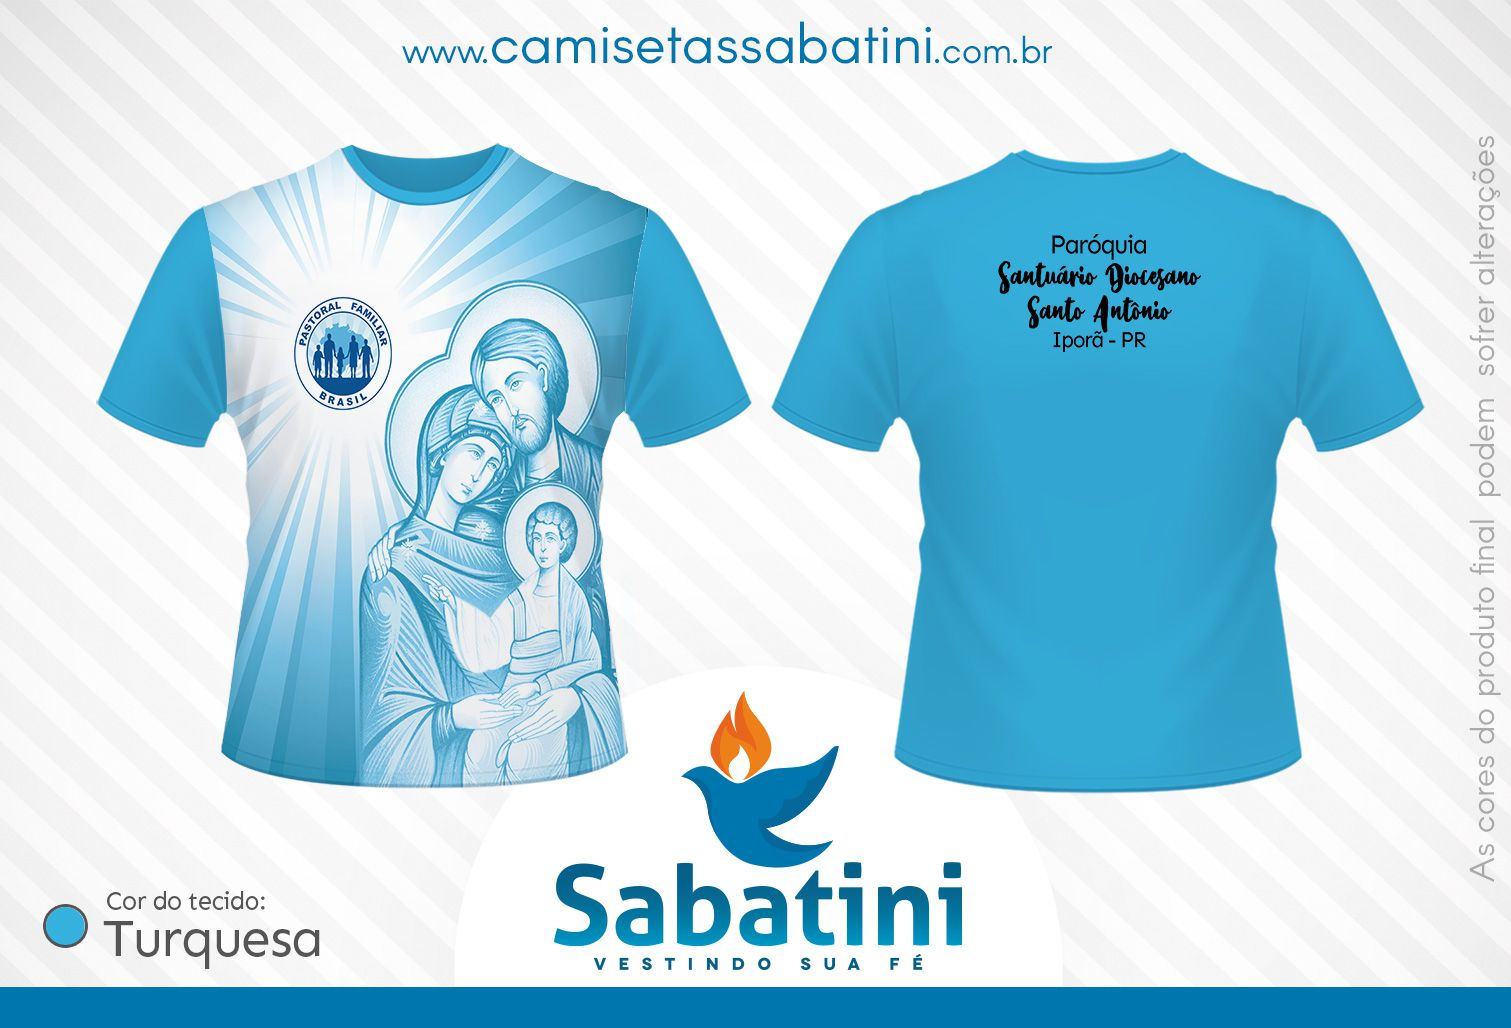 Camiseta Personalizada - Pastoral Familiar - Paróquia Santo Antônio - Iporã - PR - ID15400451  - Camisetas Sabatini